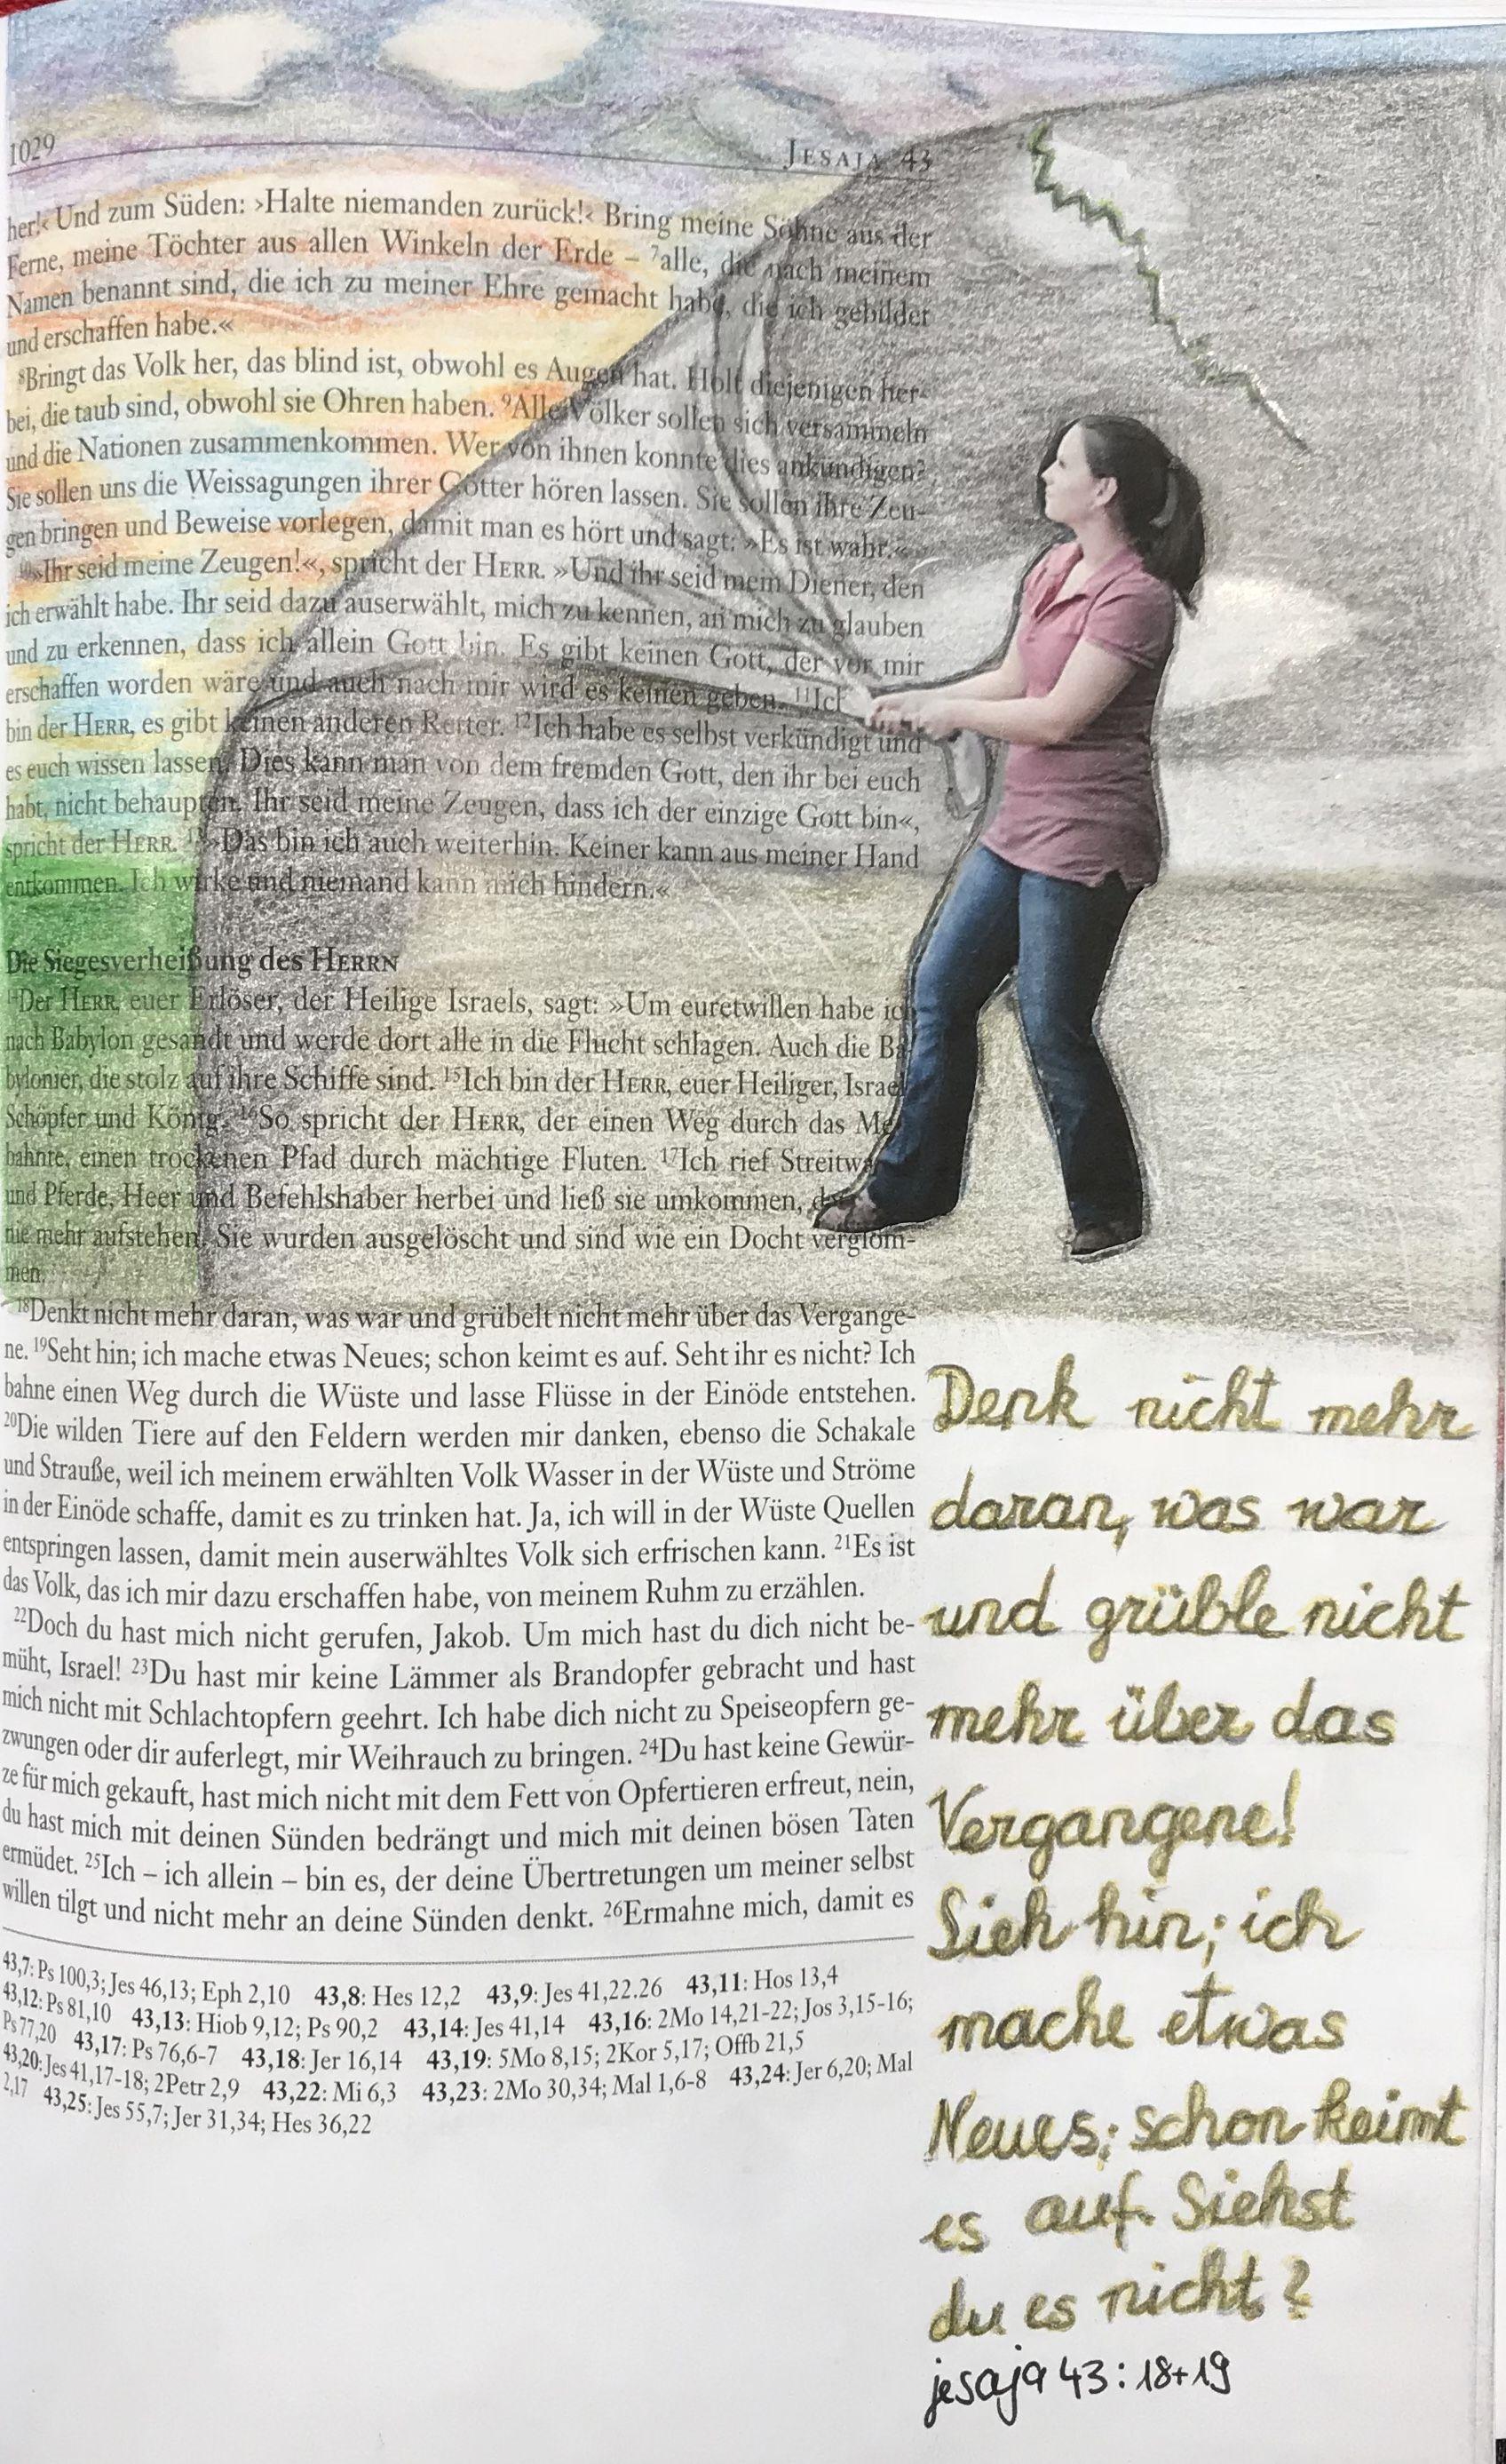 Versiculos De La Biblia De Animo: Pin De Vanessa Nevarez Gonzalez En La Biblia